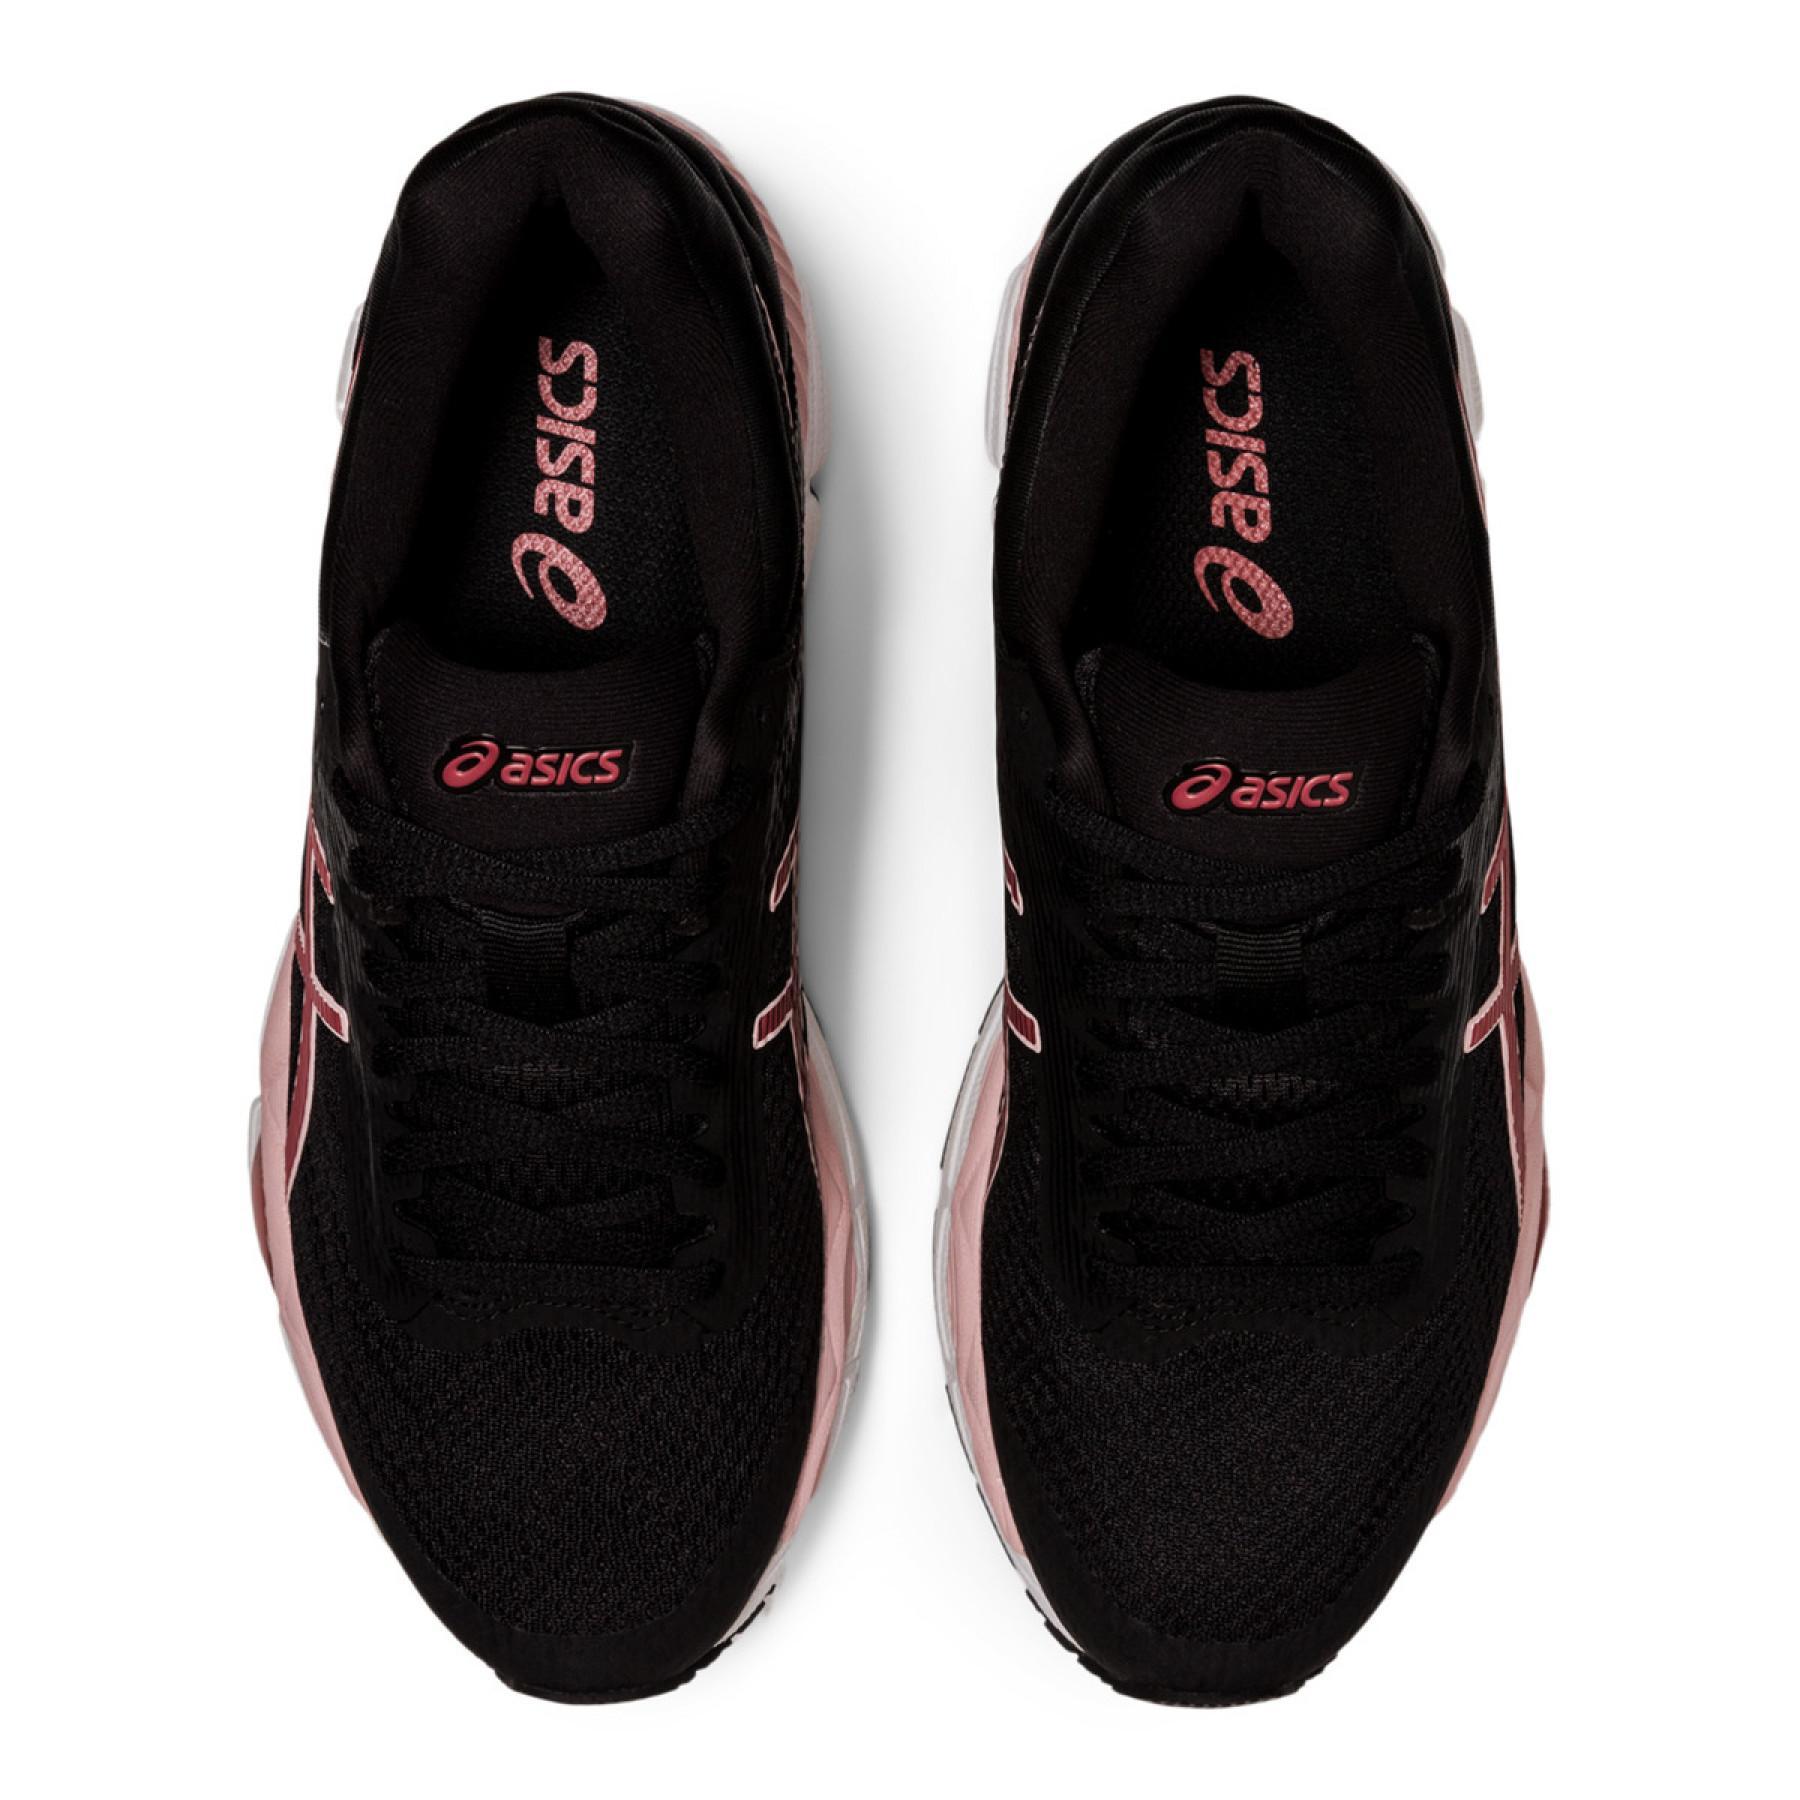 Chaussures femme Asics Gel-Glorify 4